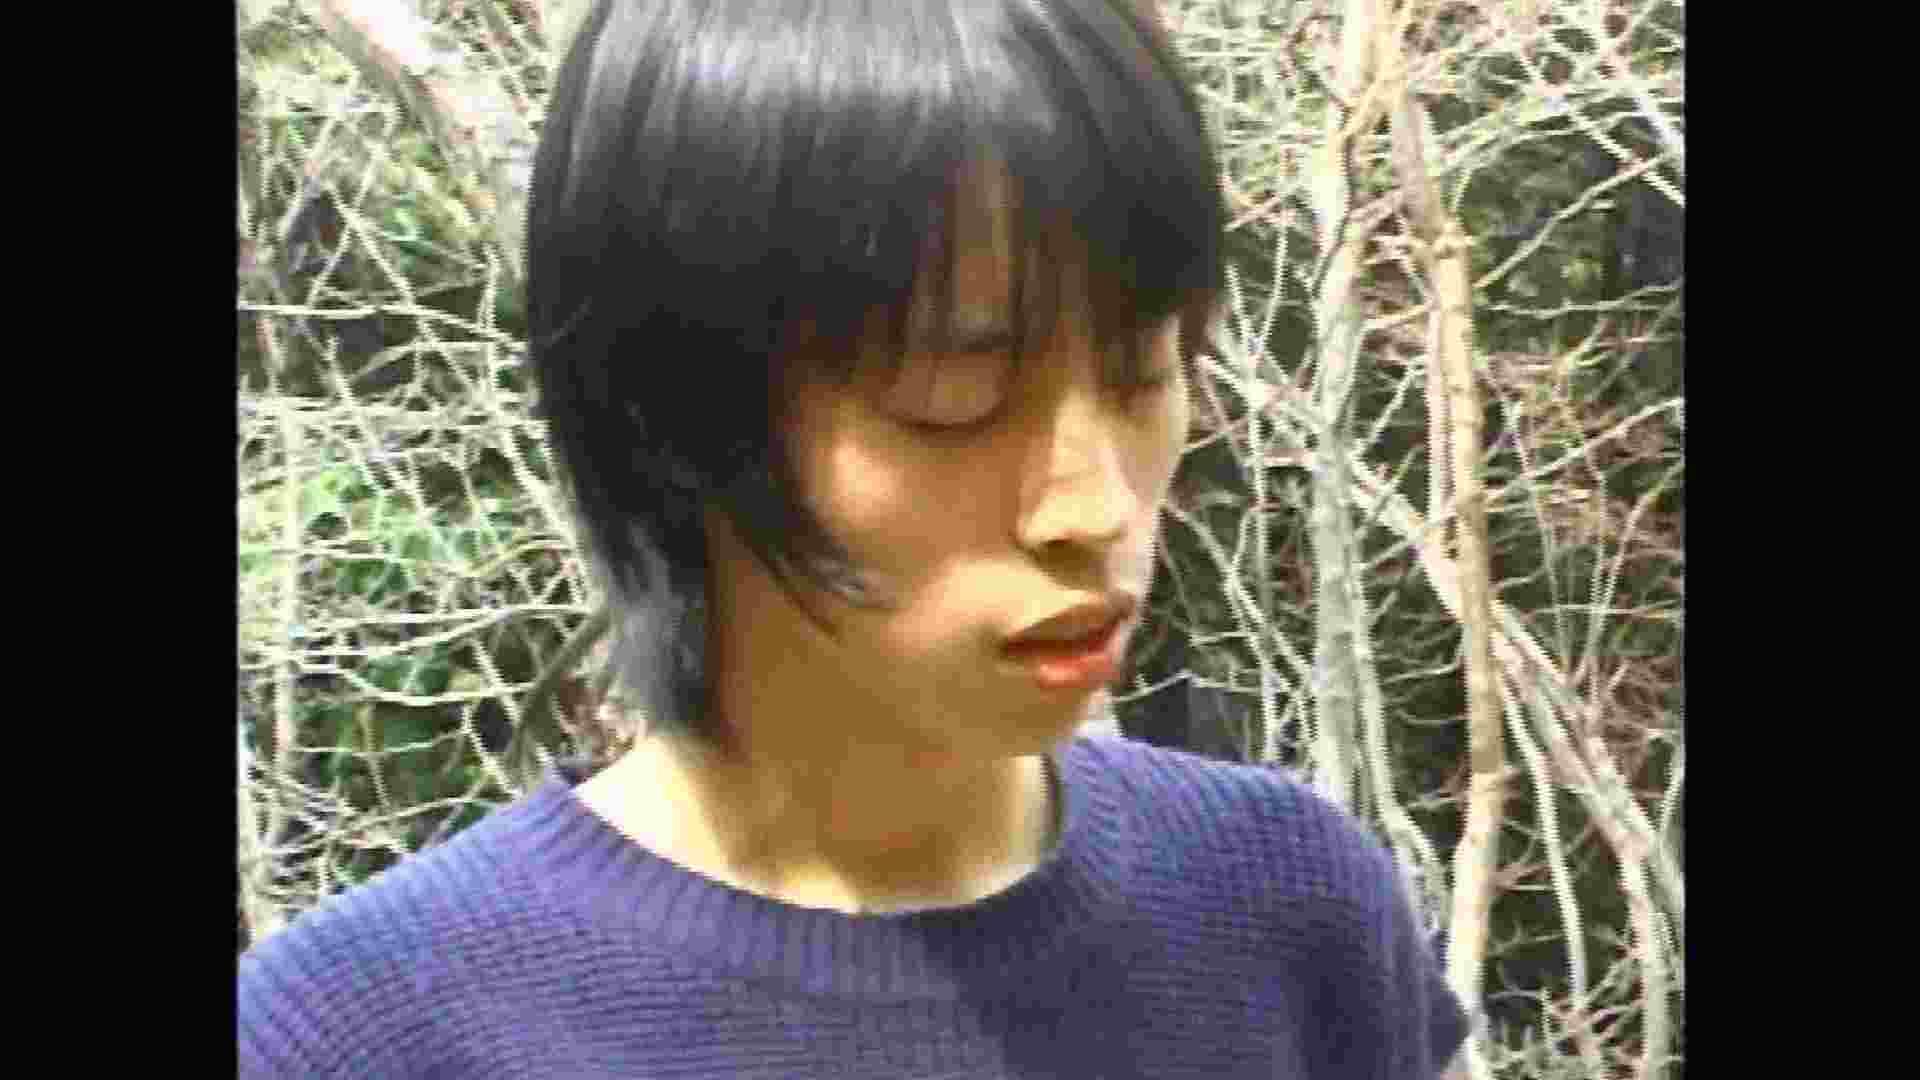 GAYBOY宏のオカズ倉庫Vol.5-3 シックスナイン ゲイヌード画像 77枚 21